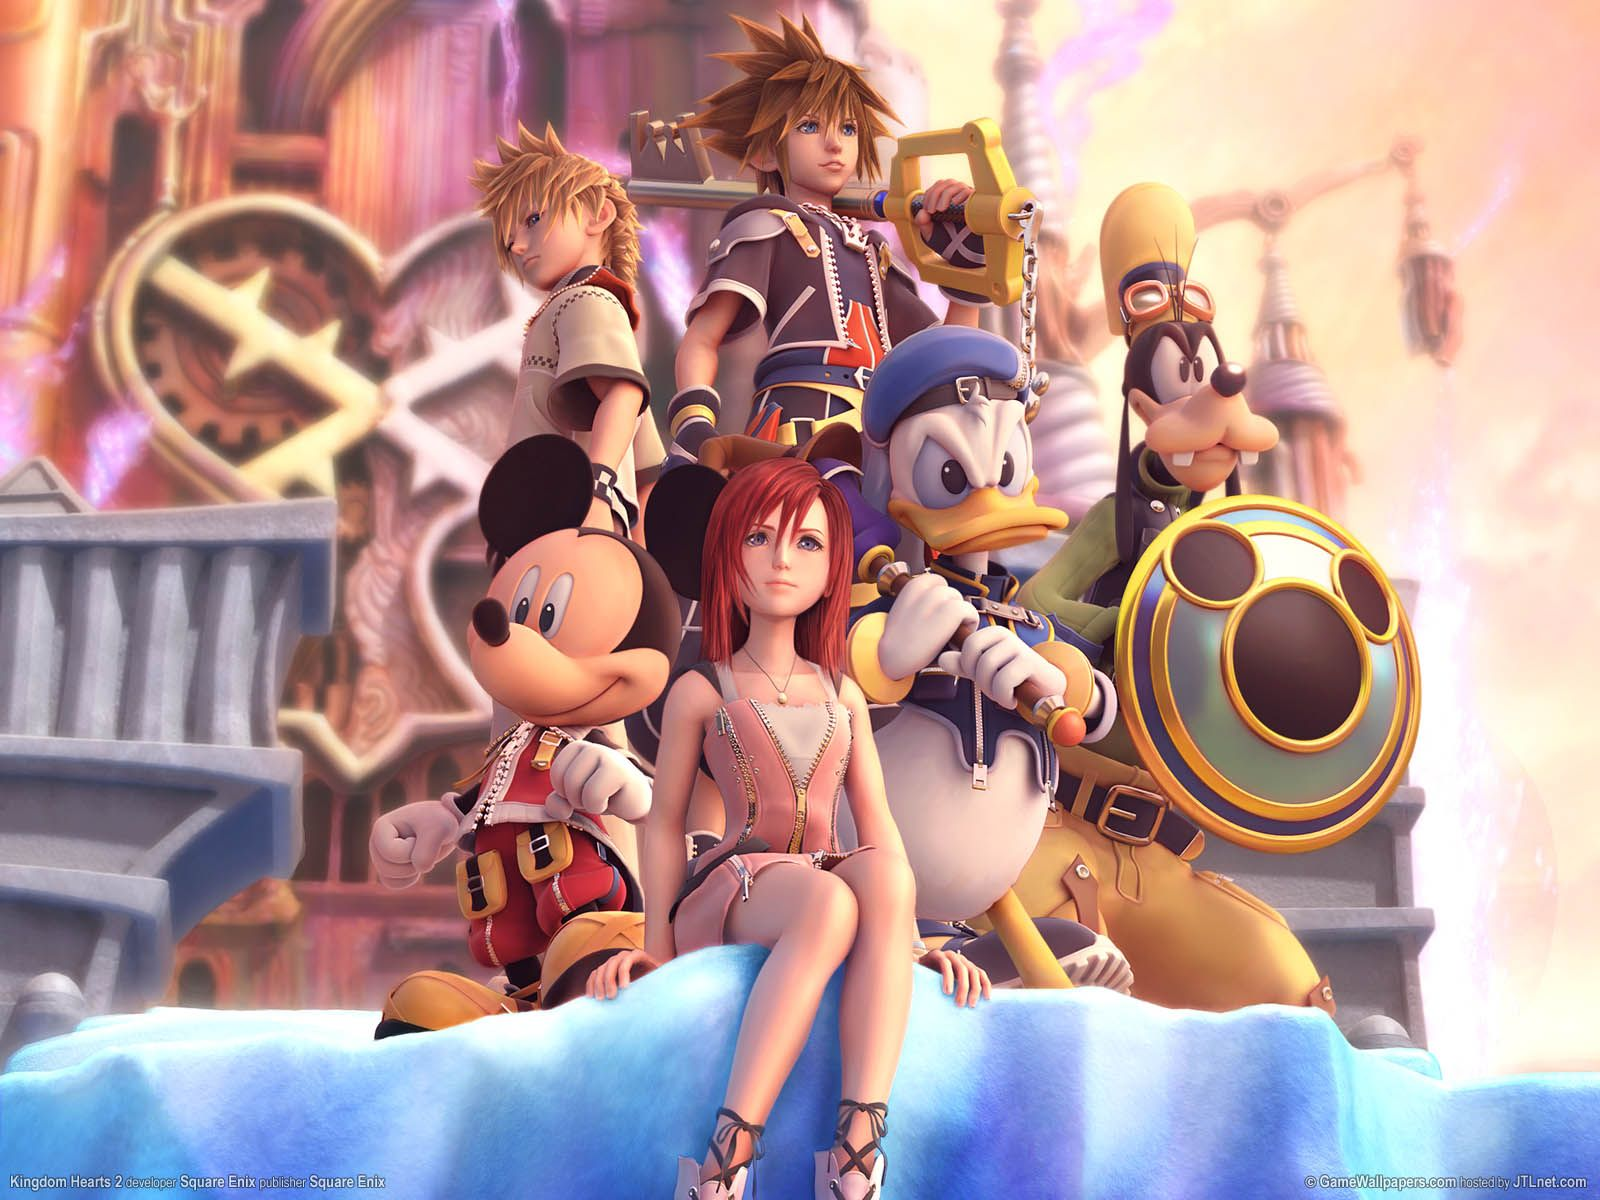 Kingdom Hearts Wallpaper And Gif Celebration Data Heavy Sidearc